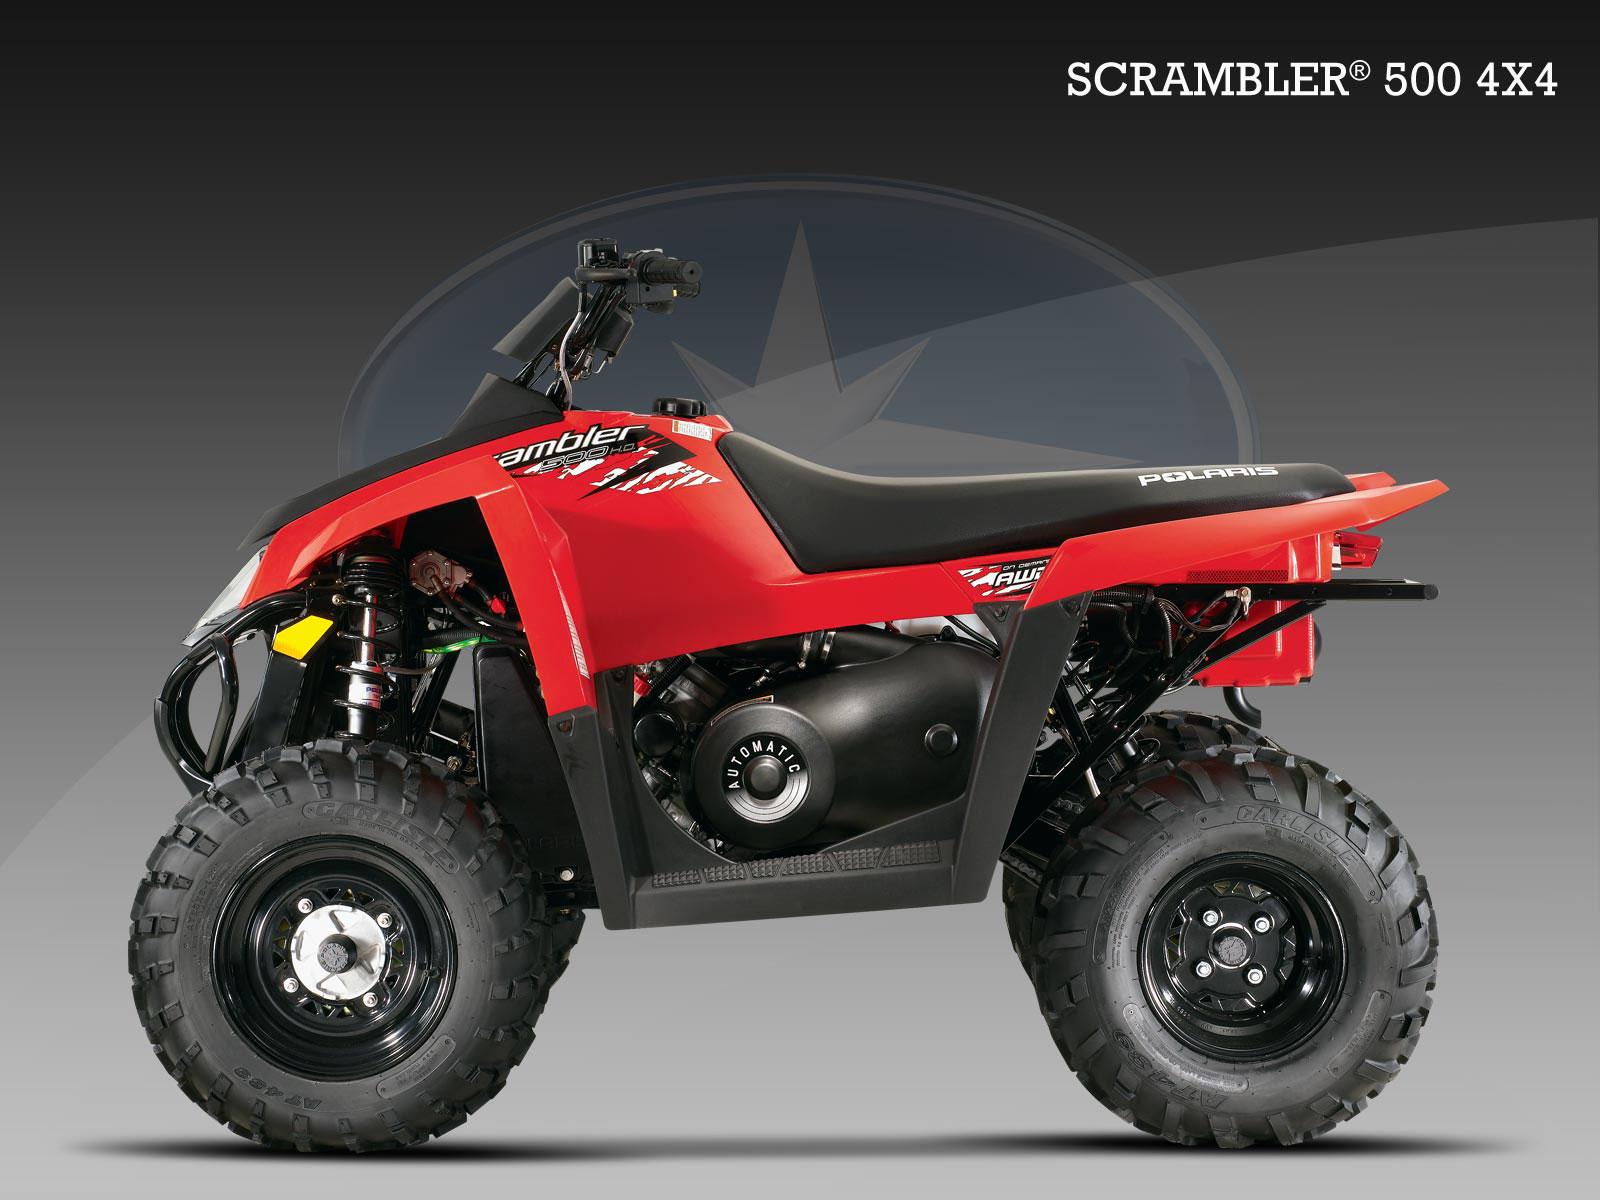 polaris scrambler 500 4x4 specs 2009 2010 autoevolution